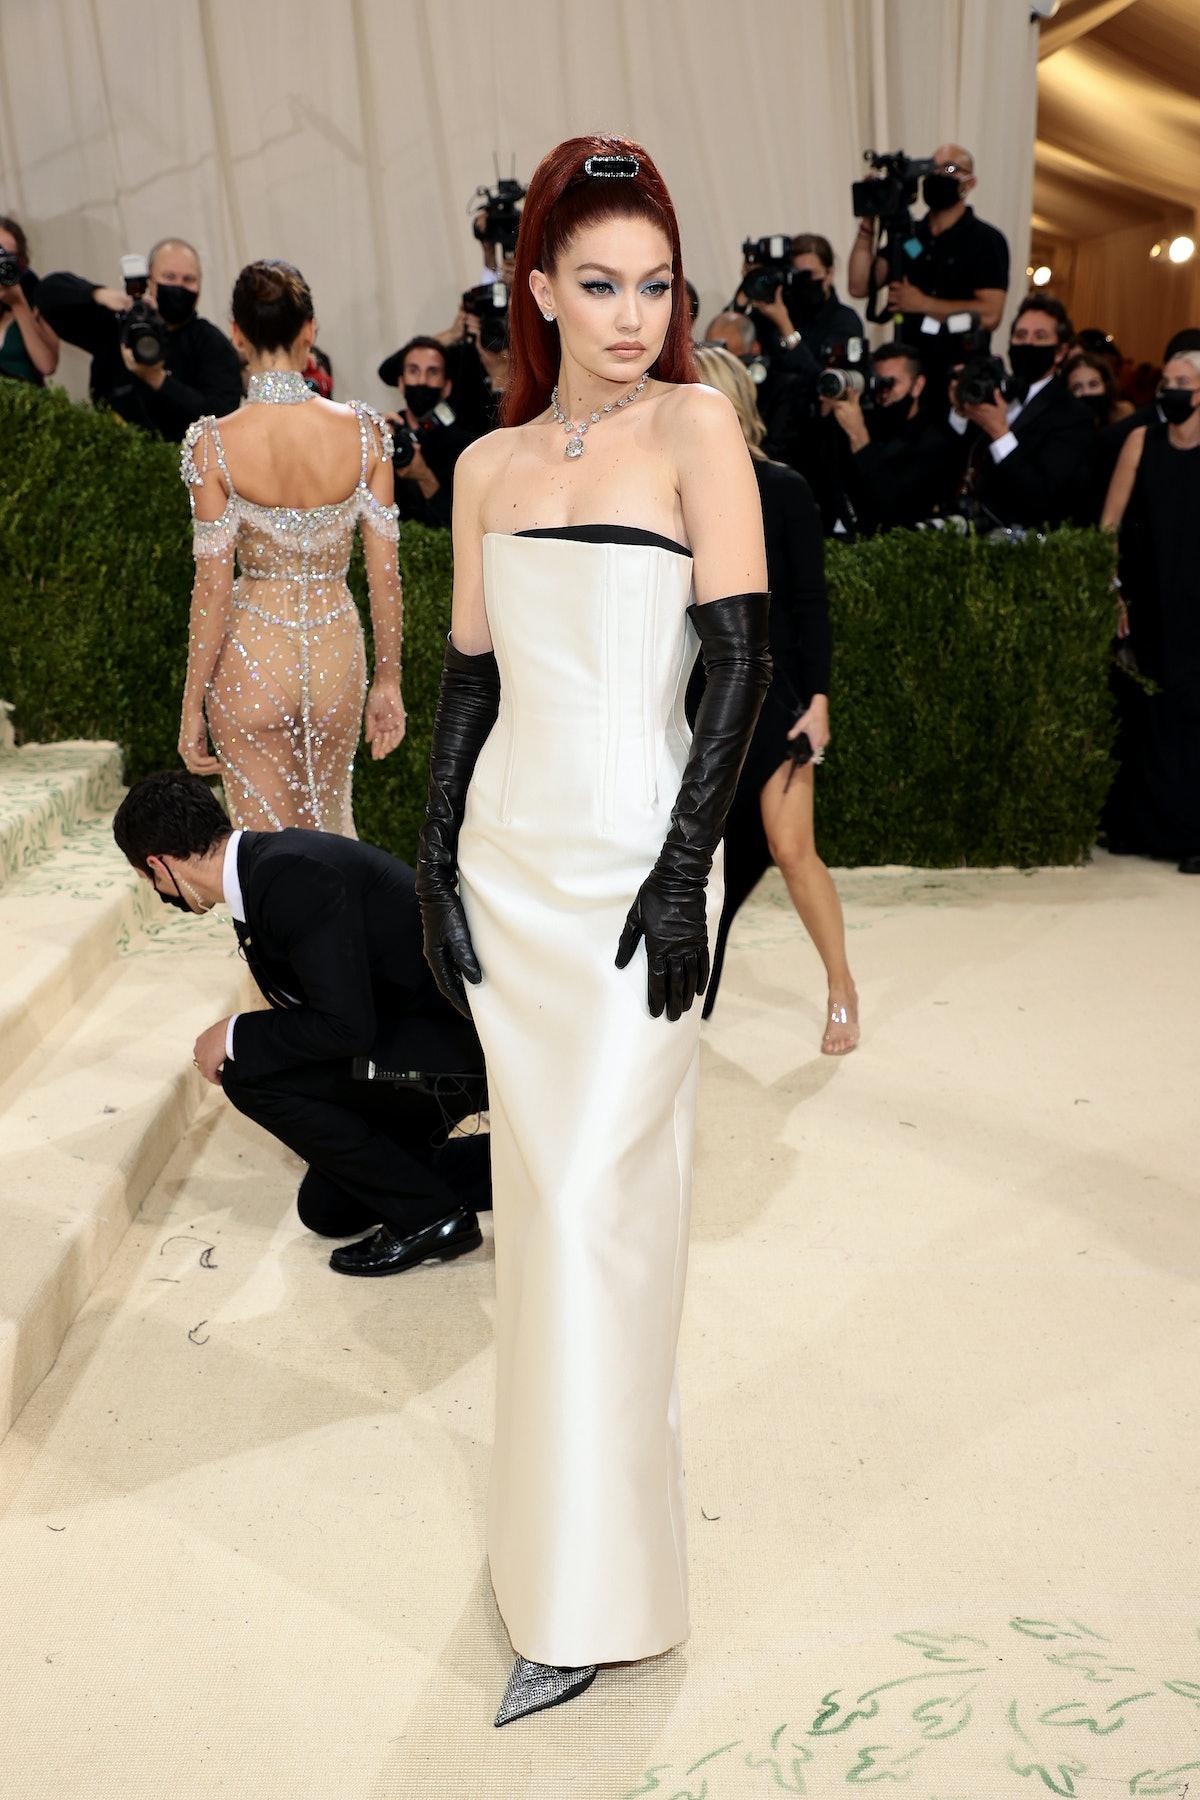 Gigi Hadid attends The 2021 Met Gala Celebrating In America: A Lexicon Of Fashion at Metropolitan Mu...